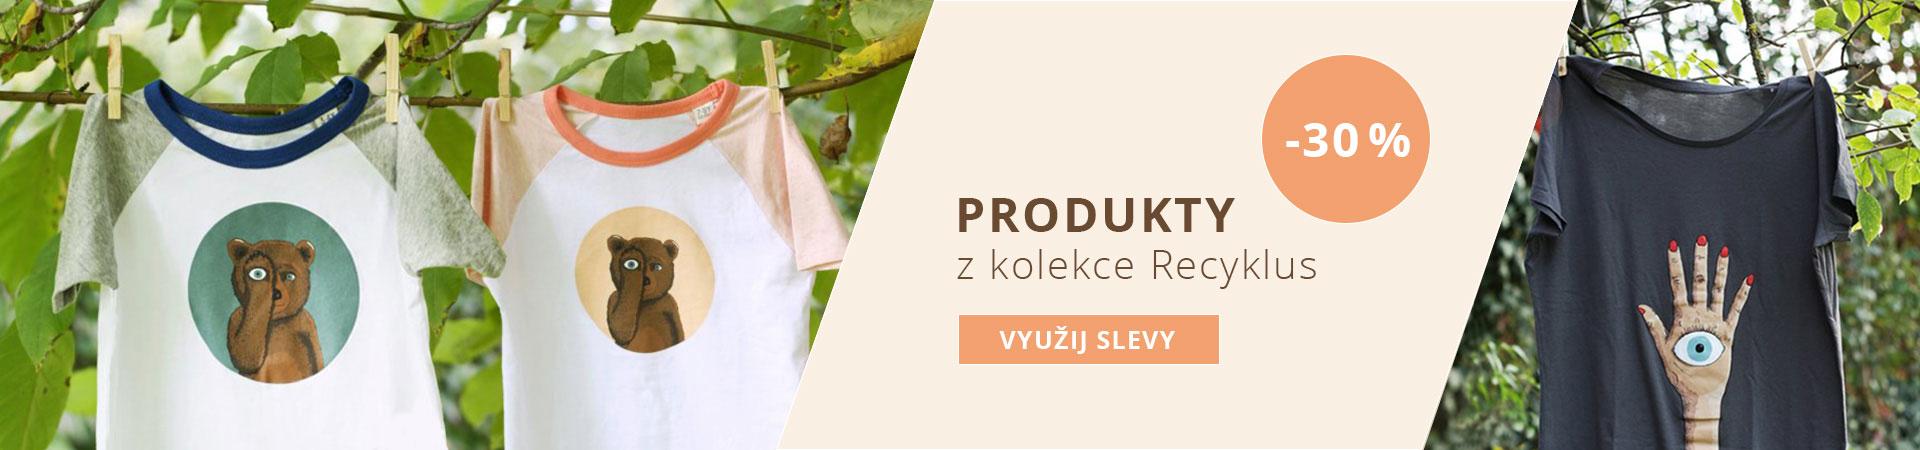 Produkty Recyklus